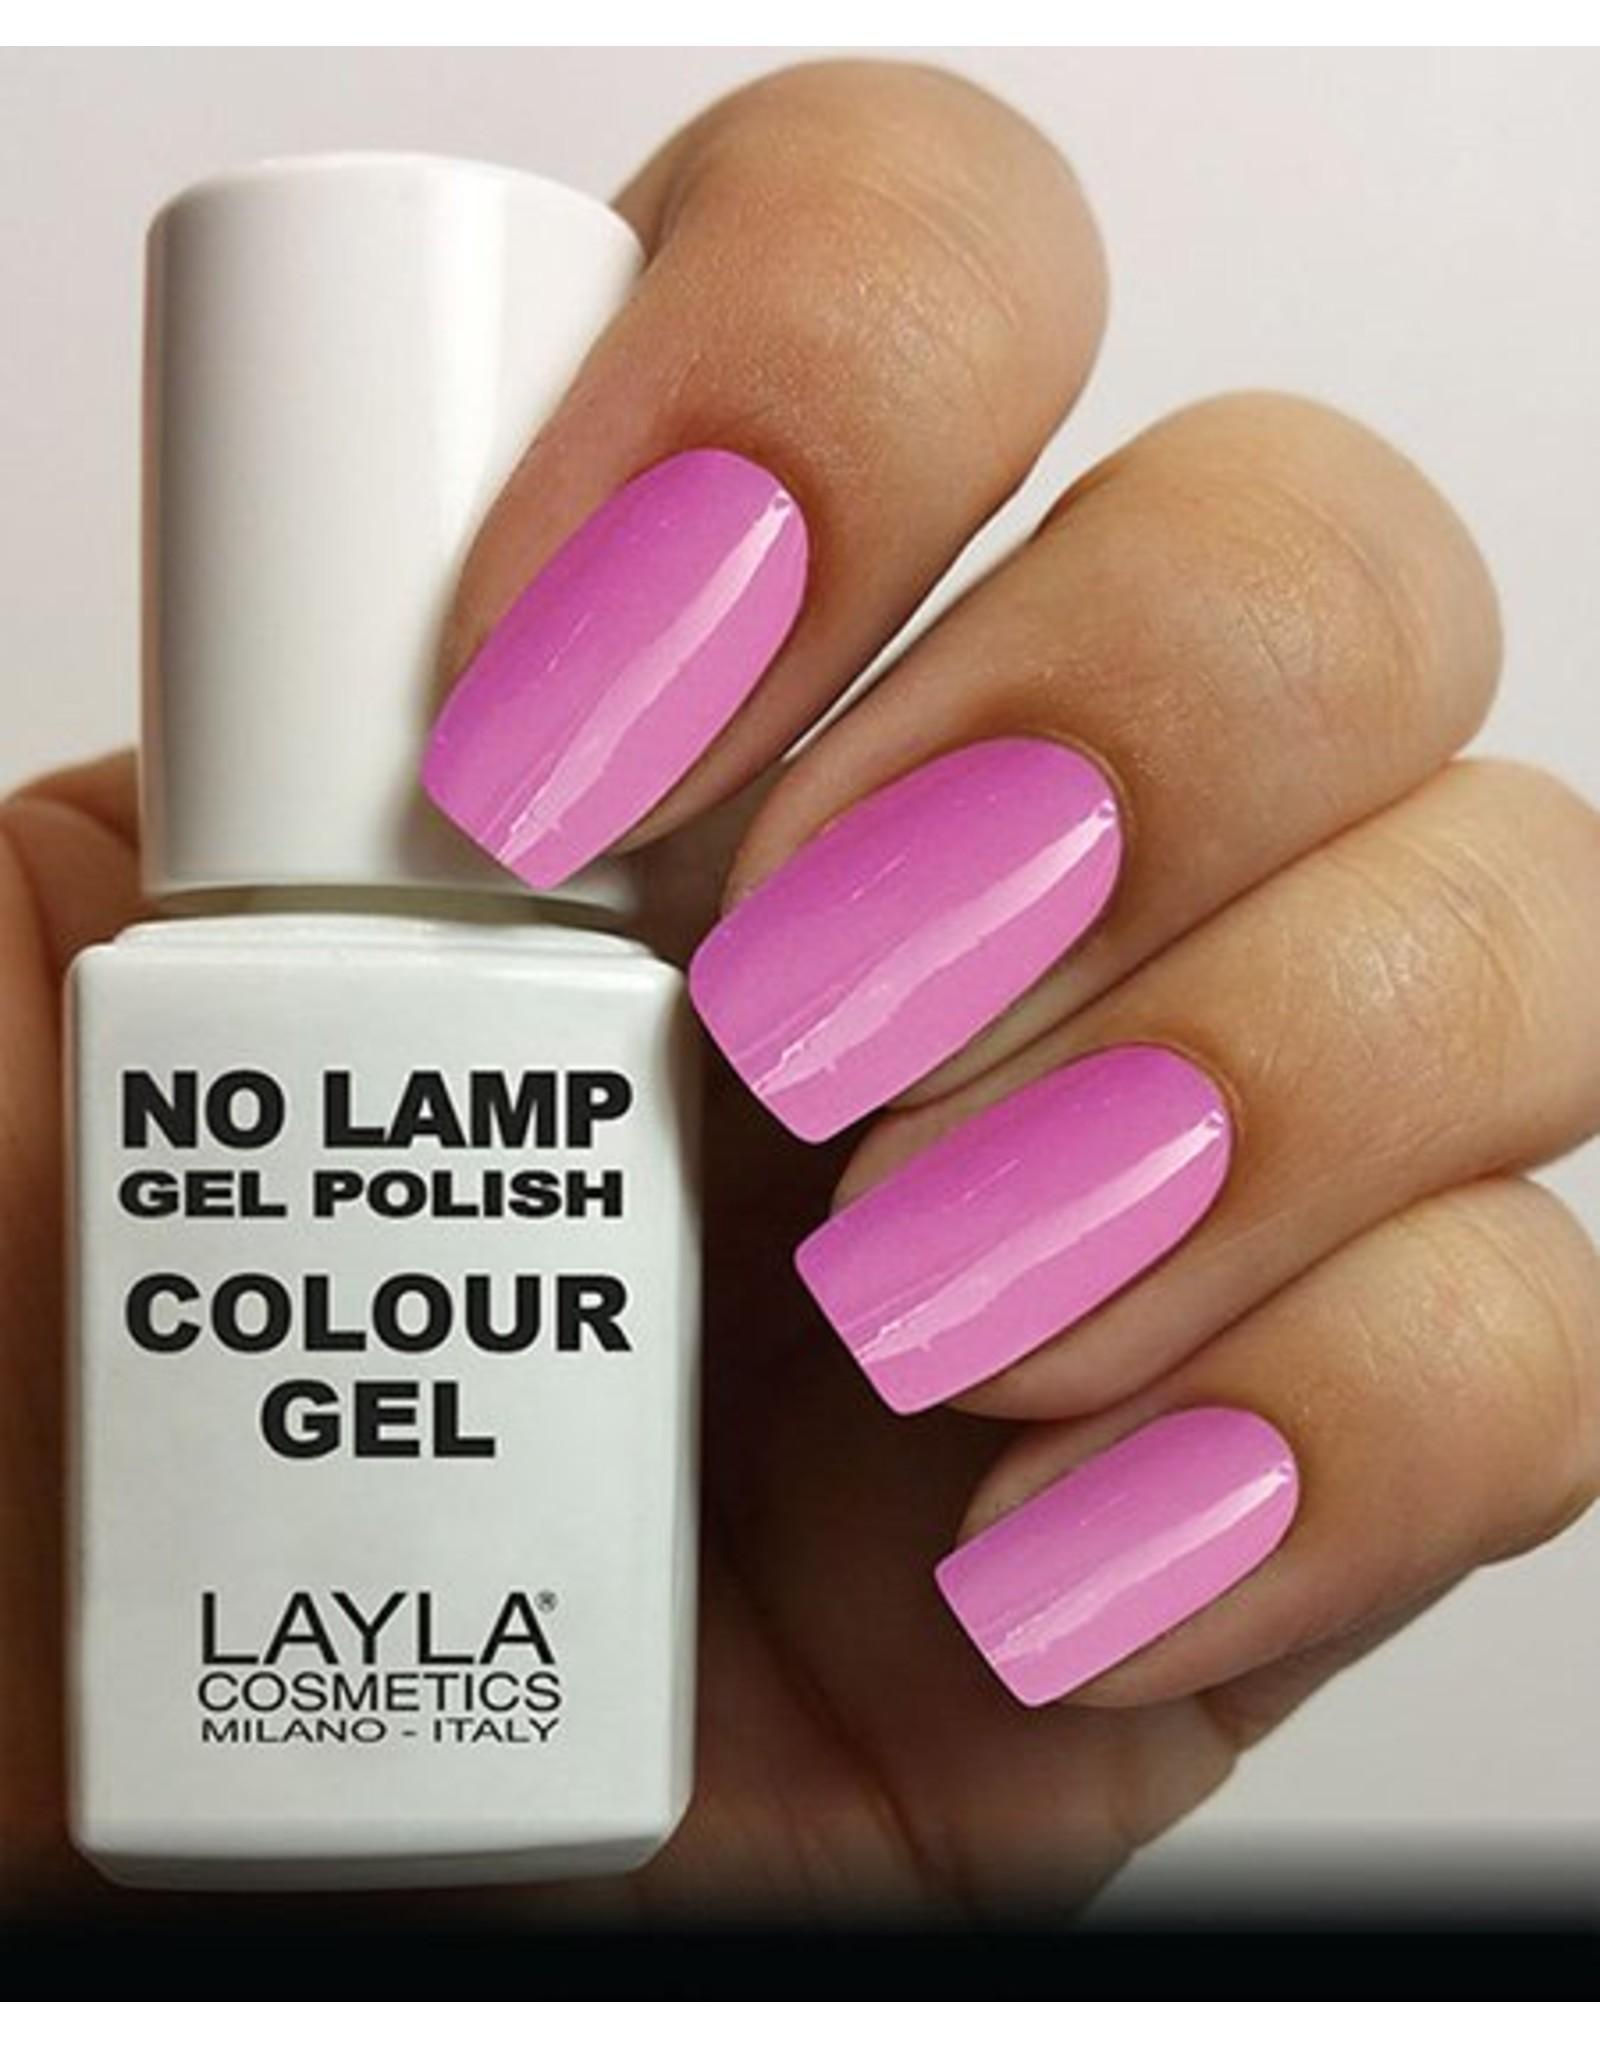 Layla Cosmetics No Lamp 14 Dance With Pink - Layla Cosmetics - Gel Polish